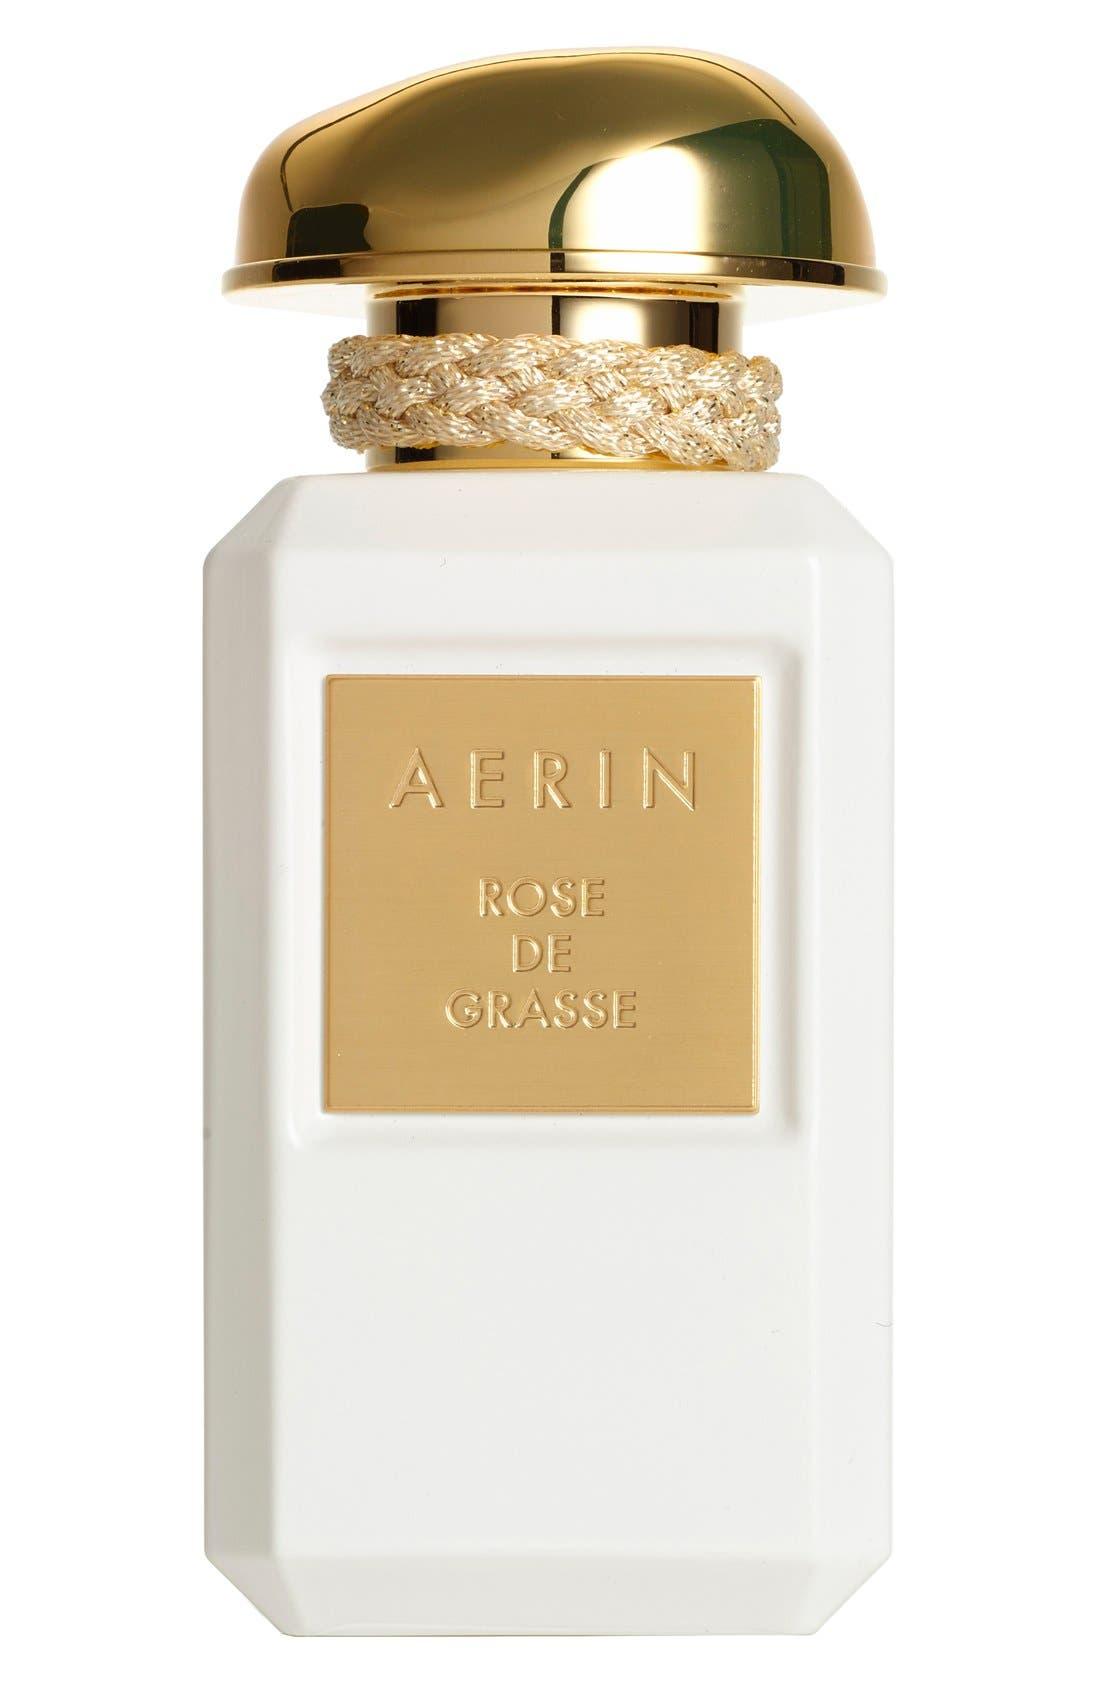 AERIN Beauty Rose de Grasse Parfum